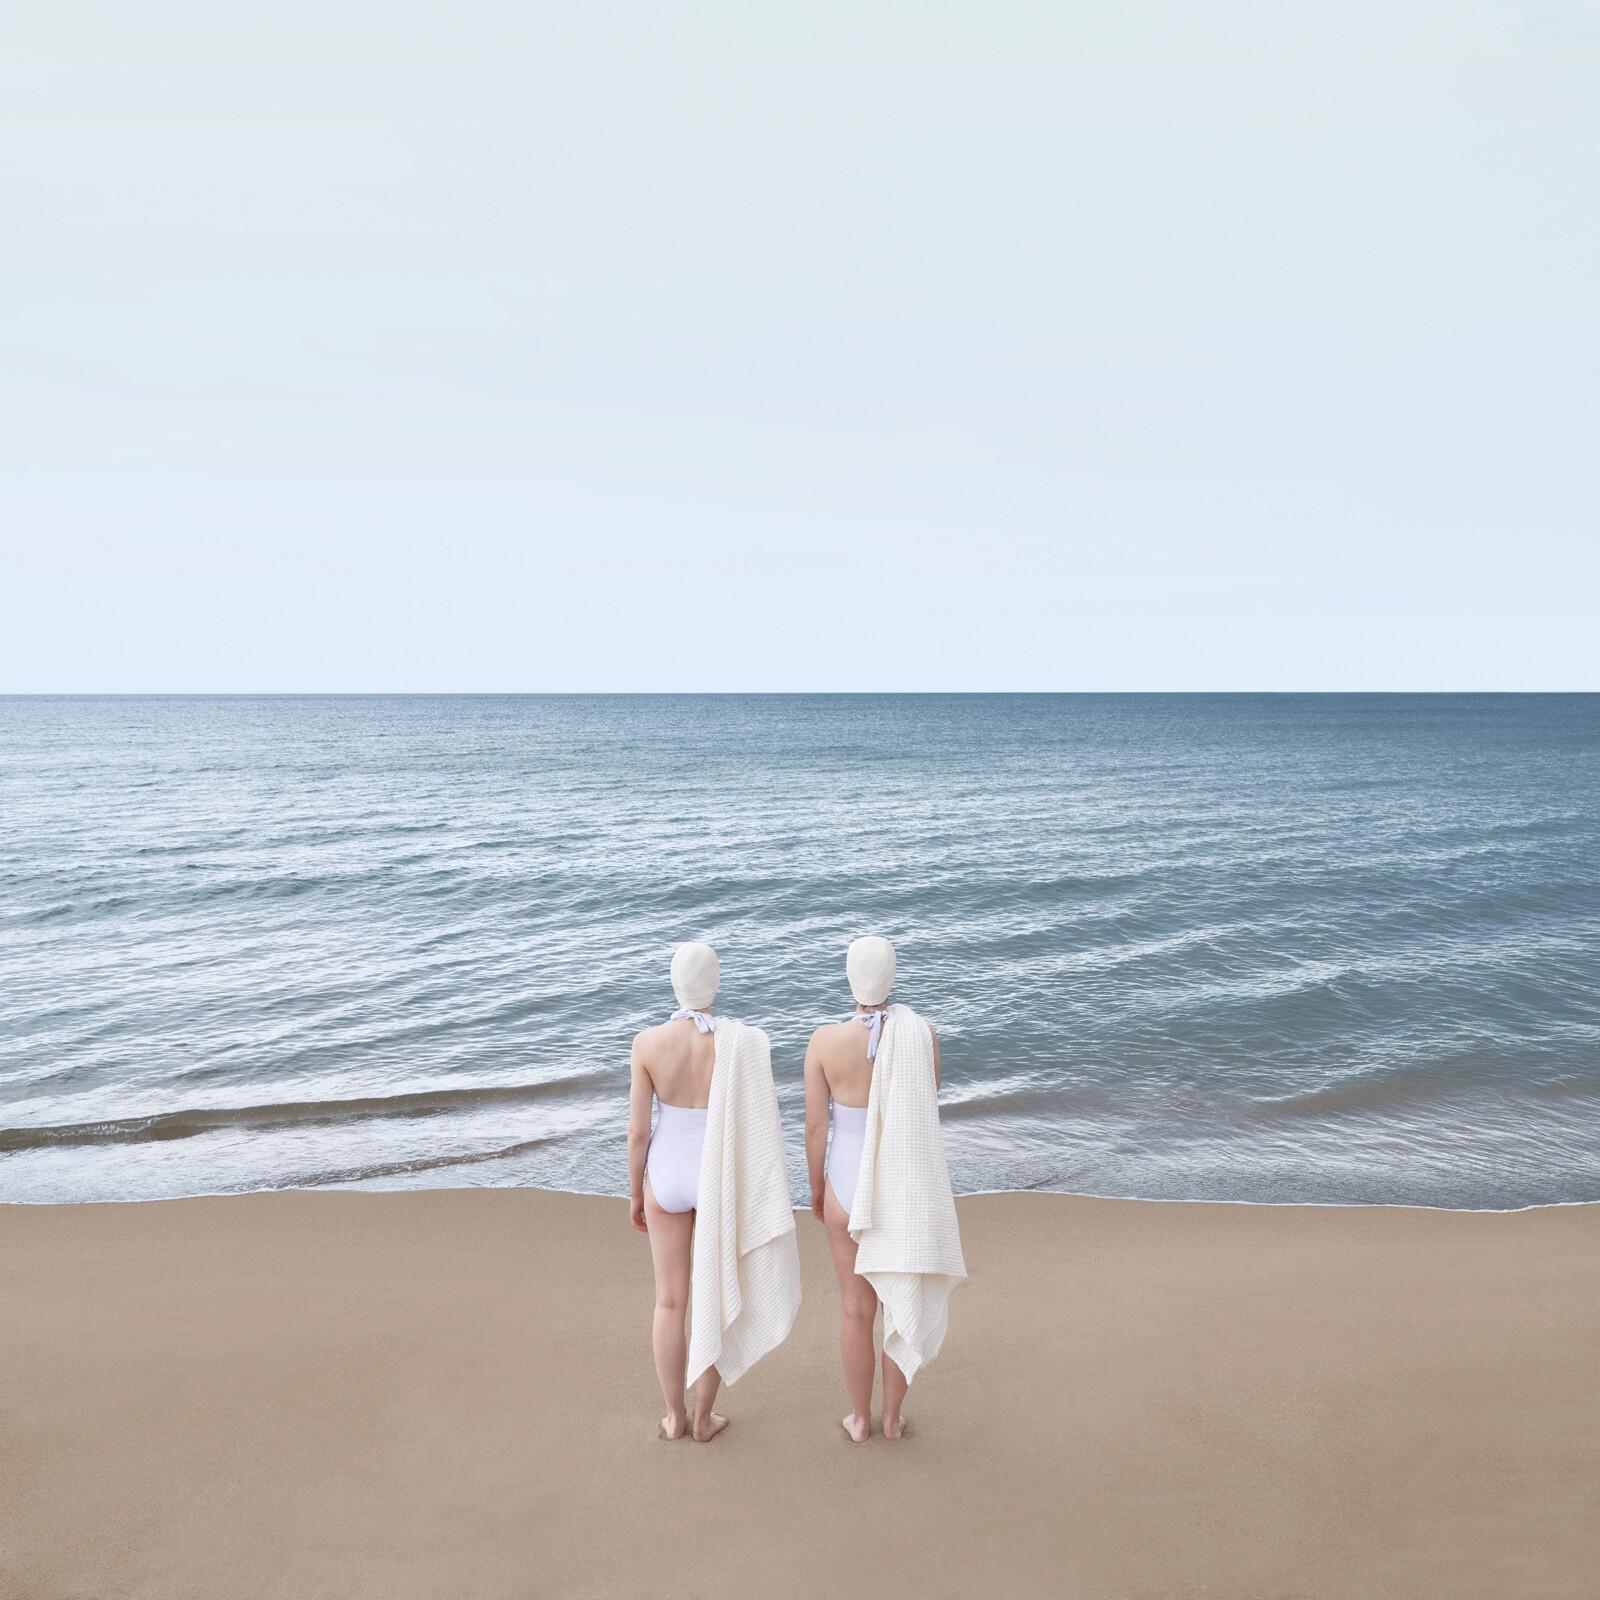 First Swim - Soo Burnell